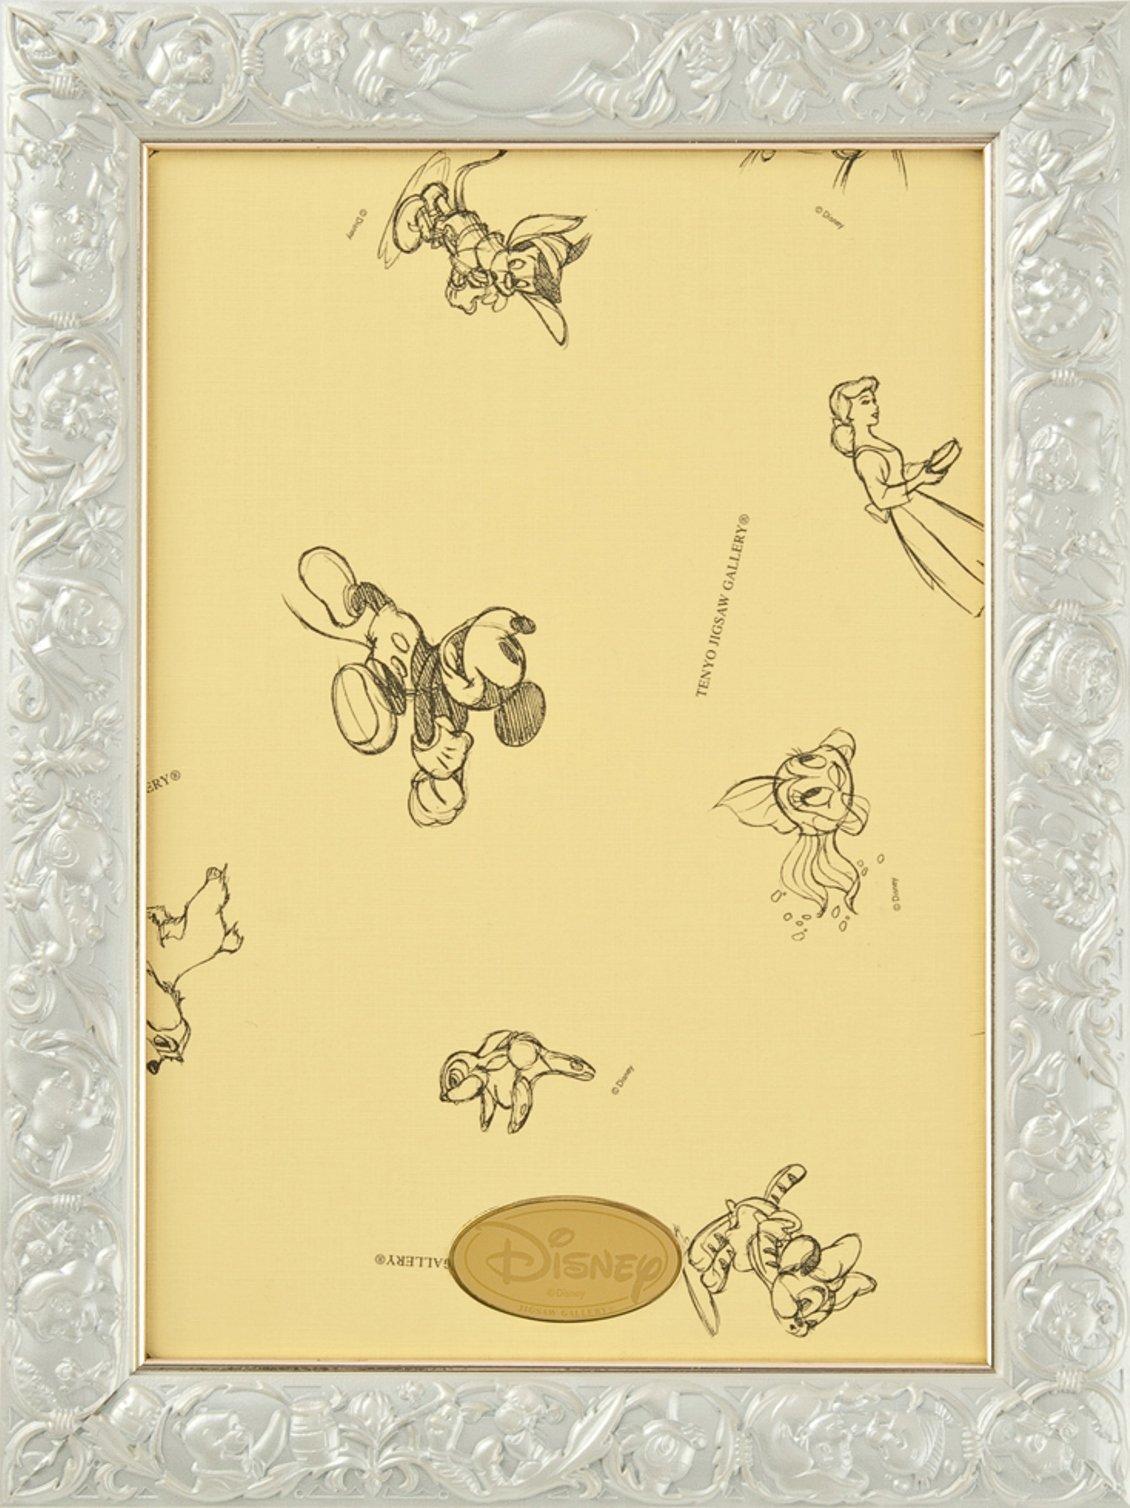 Puzzle frame Disney Characters Art figure panel 108P Pearl White (18.2x25.7cm) ディズニーキャラクターズ アートフィギュアパネル 108P用 パールホワイト